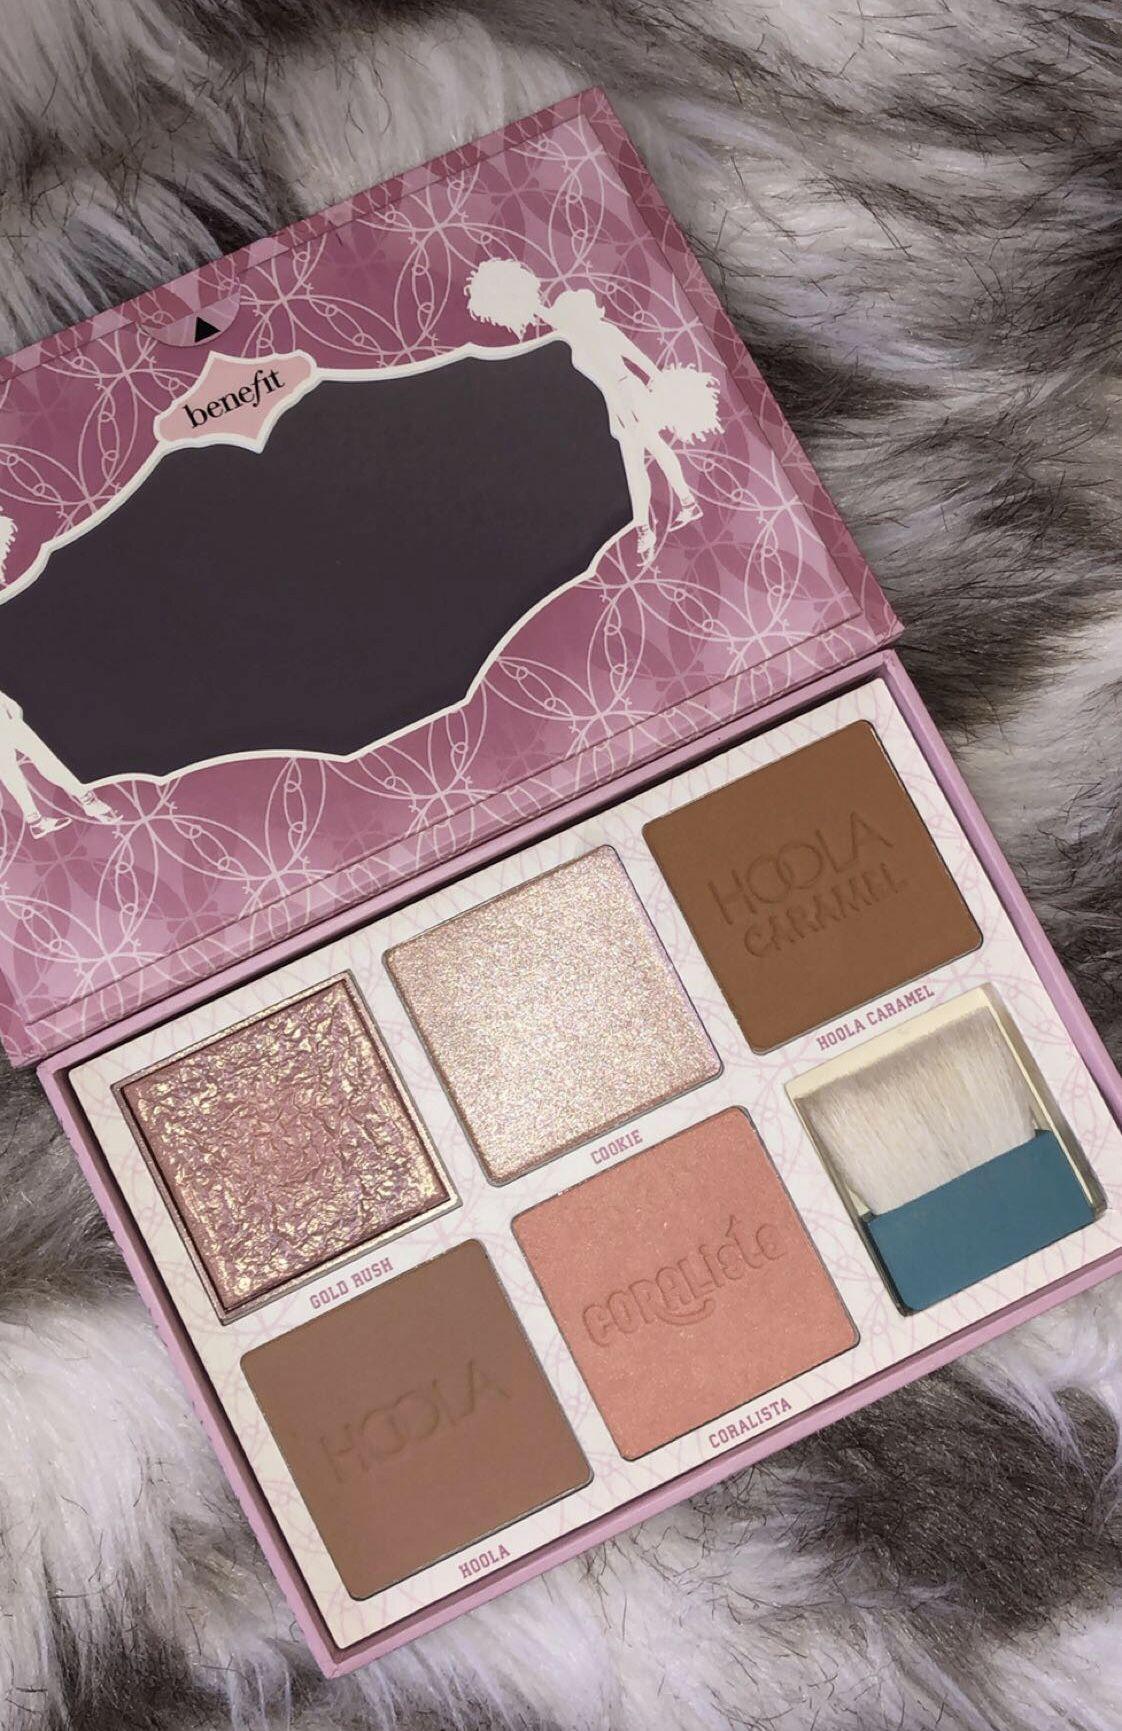 Benefit Cosmetics blush bronzer and highlight palette